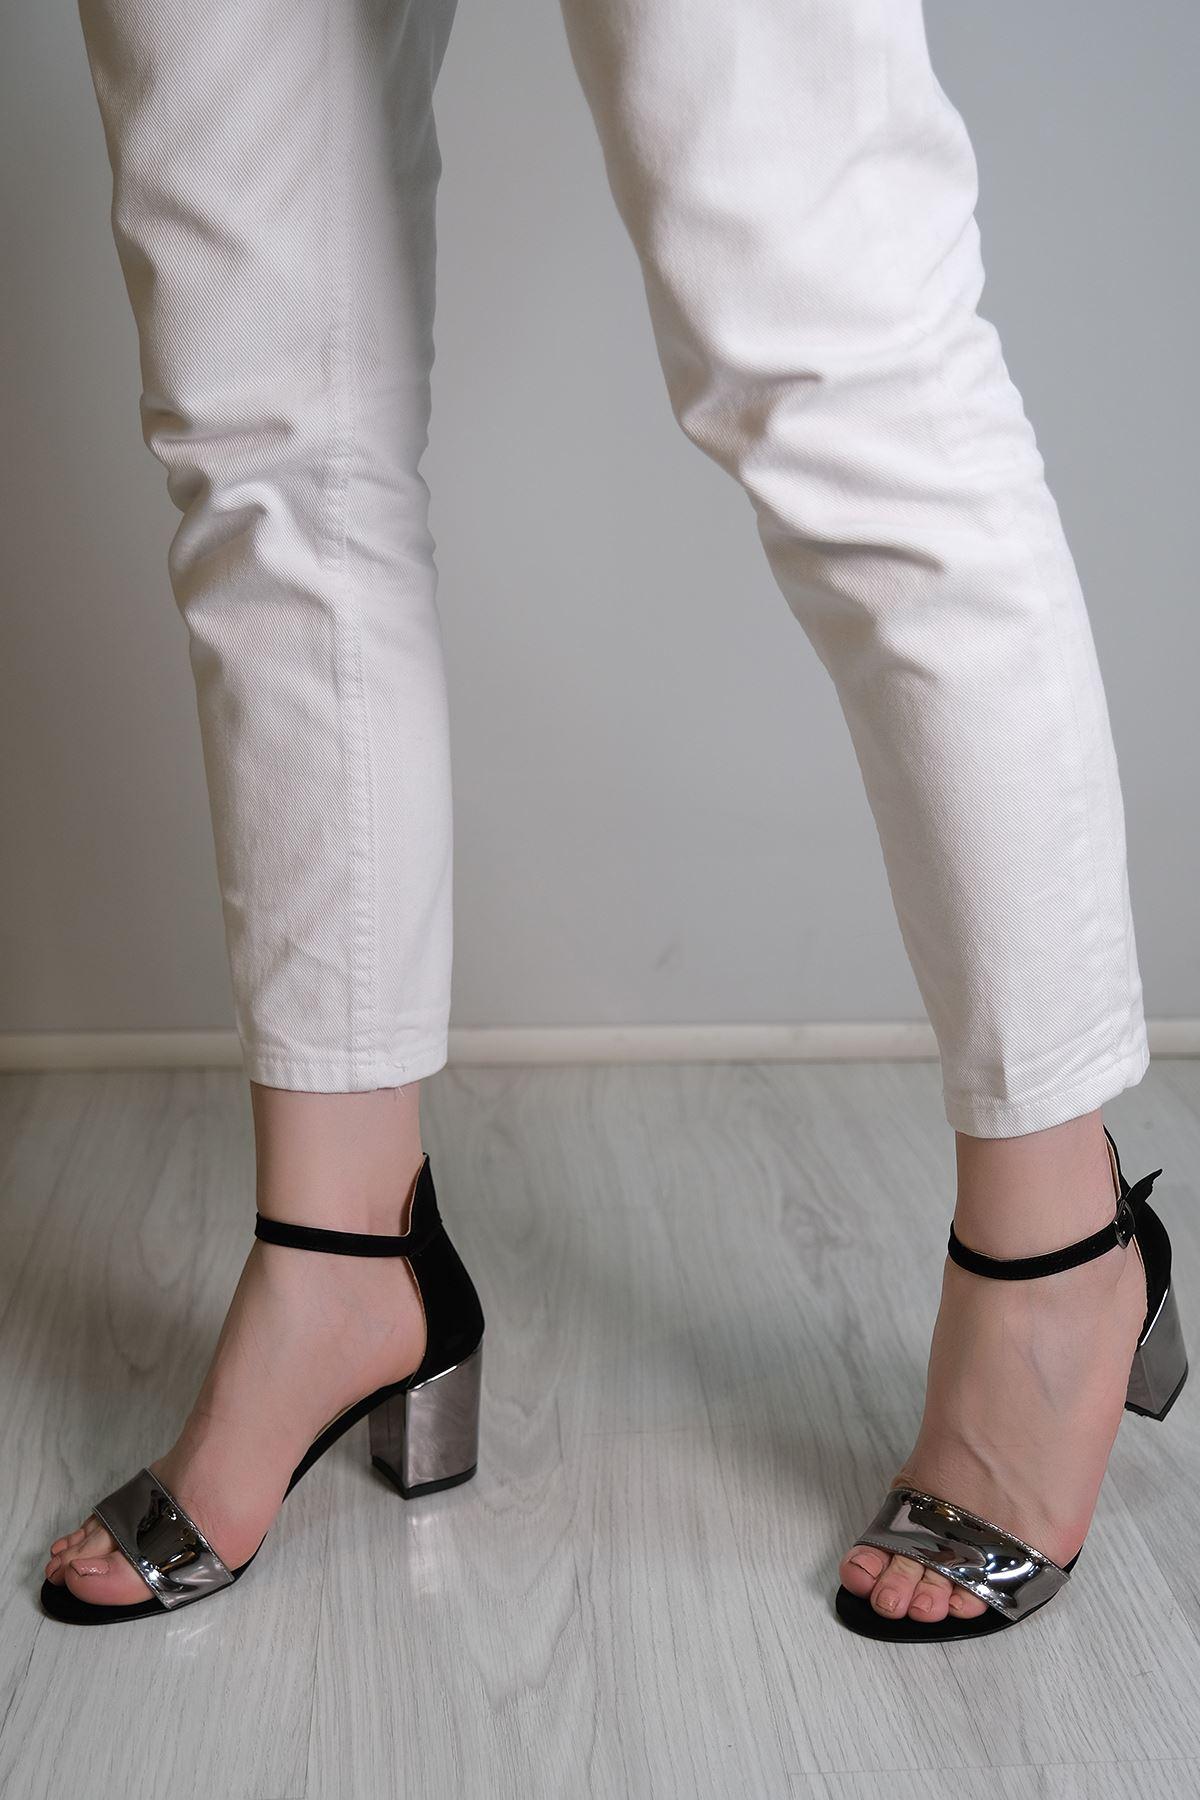 7 Cm Ayna Topuklu Ayakkabı Platin - 5857.264.